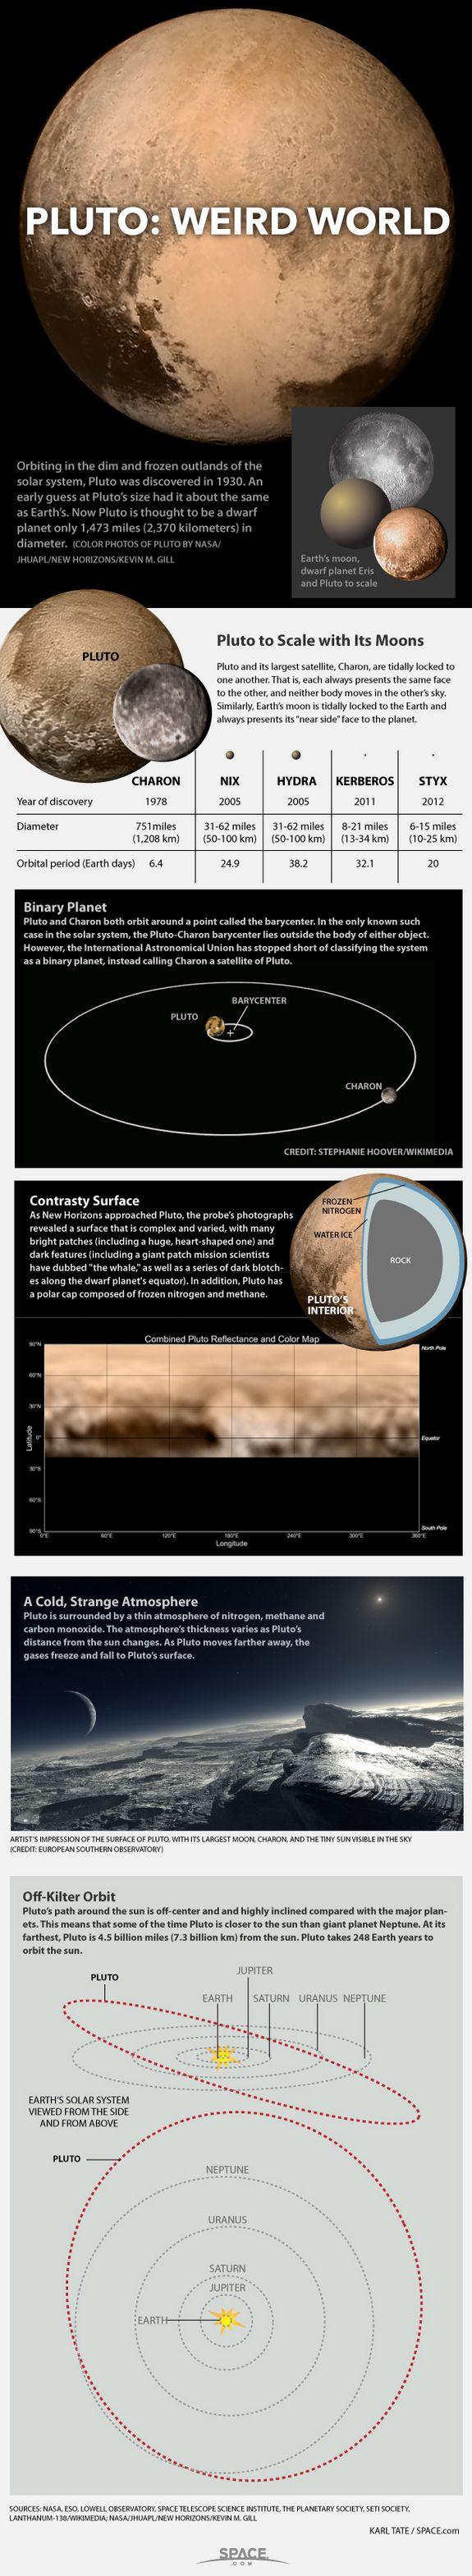 Pluto: A Dwarf Planet Oddity, SPACE.com | July 2012